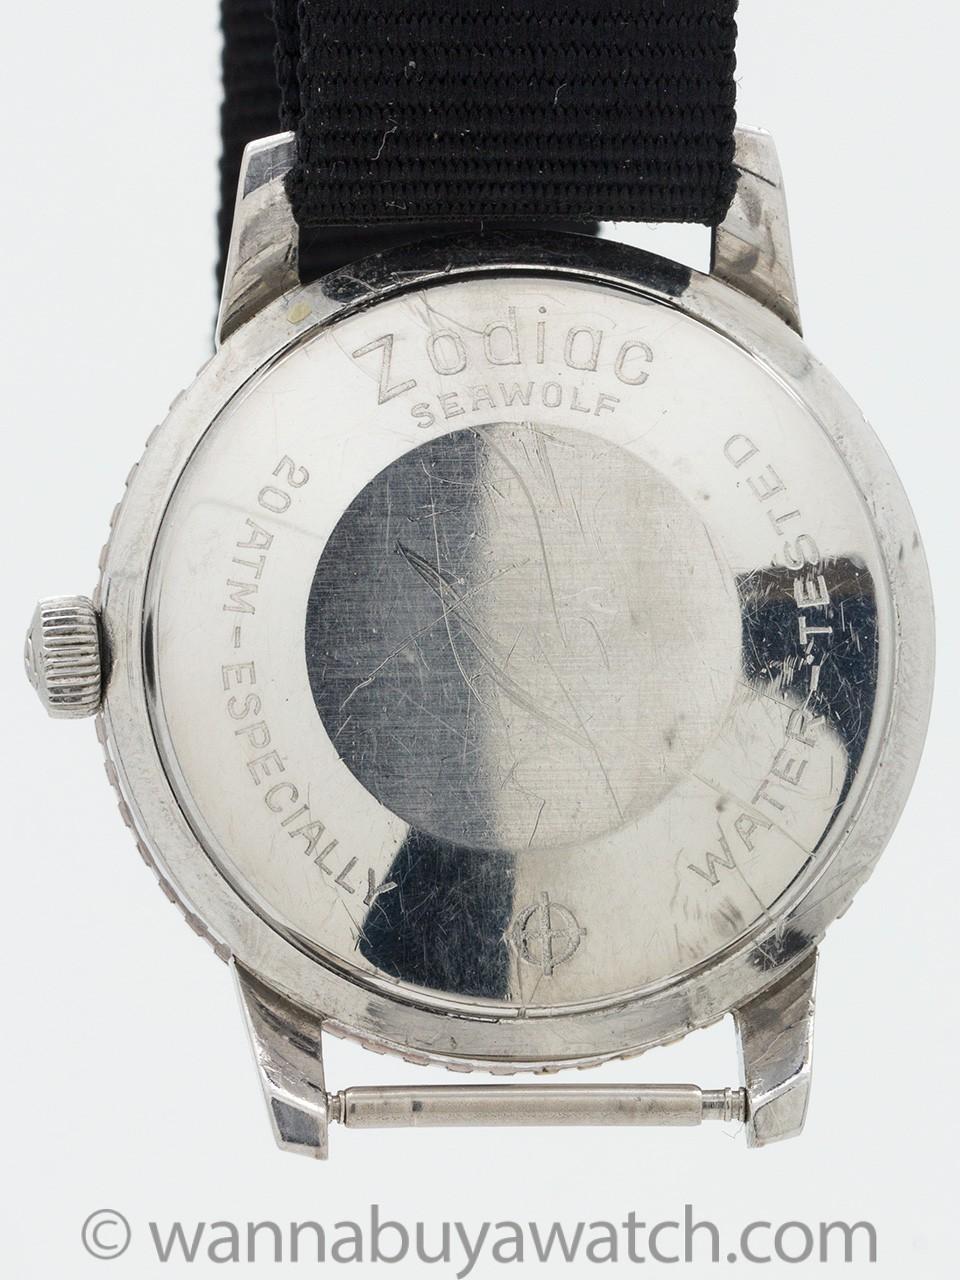 Zodiac Seawolf Stainless Steel circa 1960's